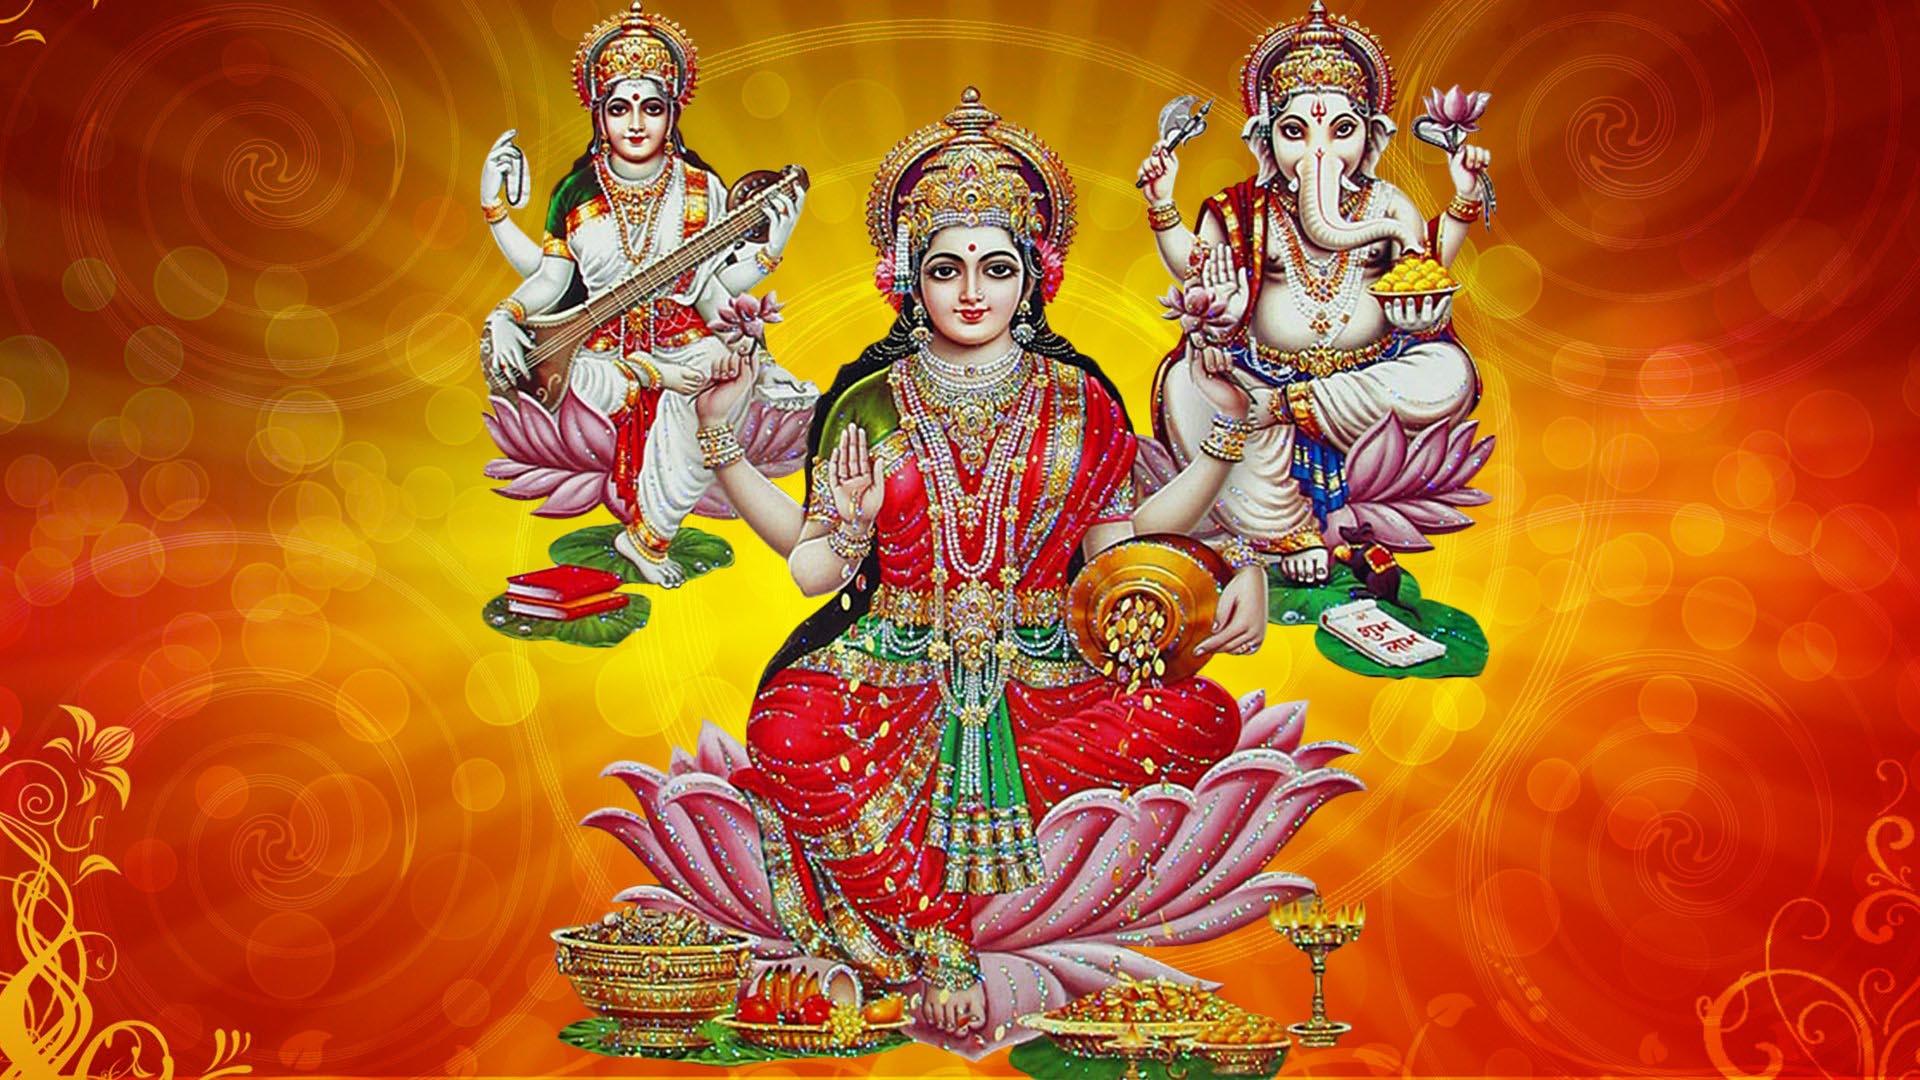 Laxmi Mata Image Download - HD Wallpaper